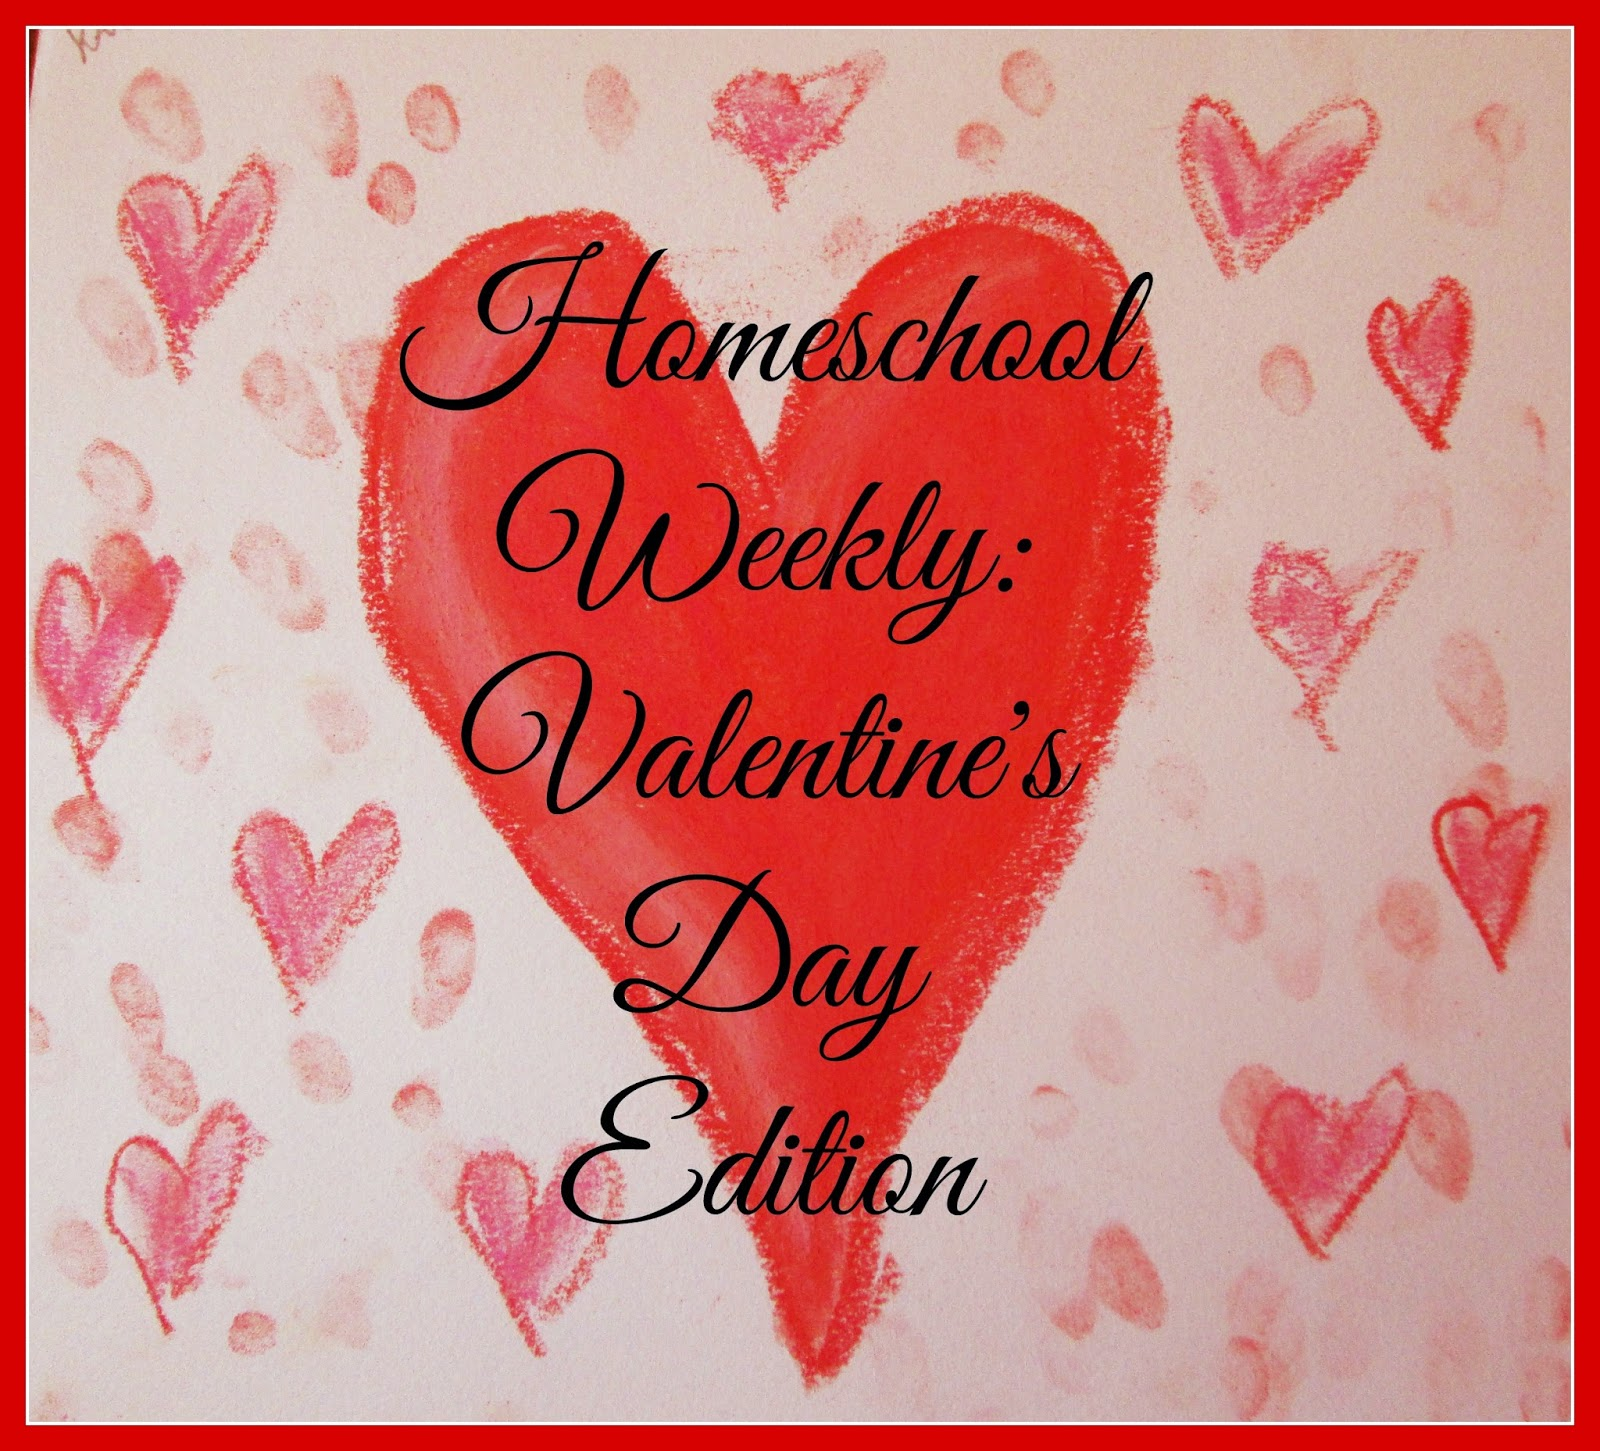 Homeschool Weekly: Valentine's Day Edition @ kympossibleblog.blogspot.com